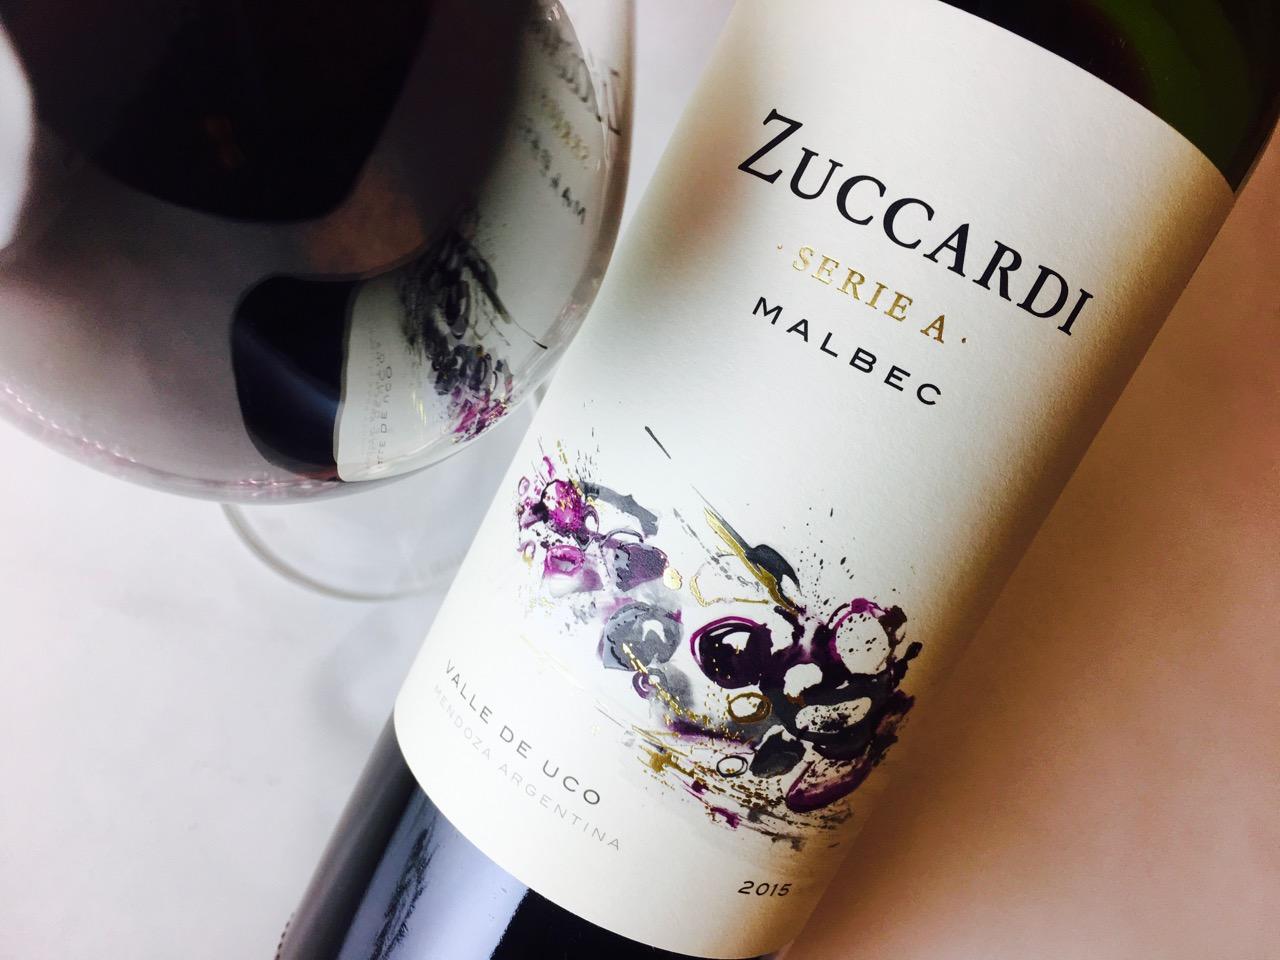 2015 Zuccardi Malbec Serie A Valle de Uco